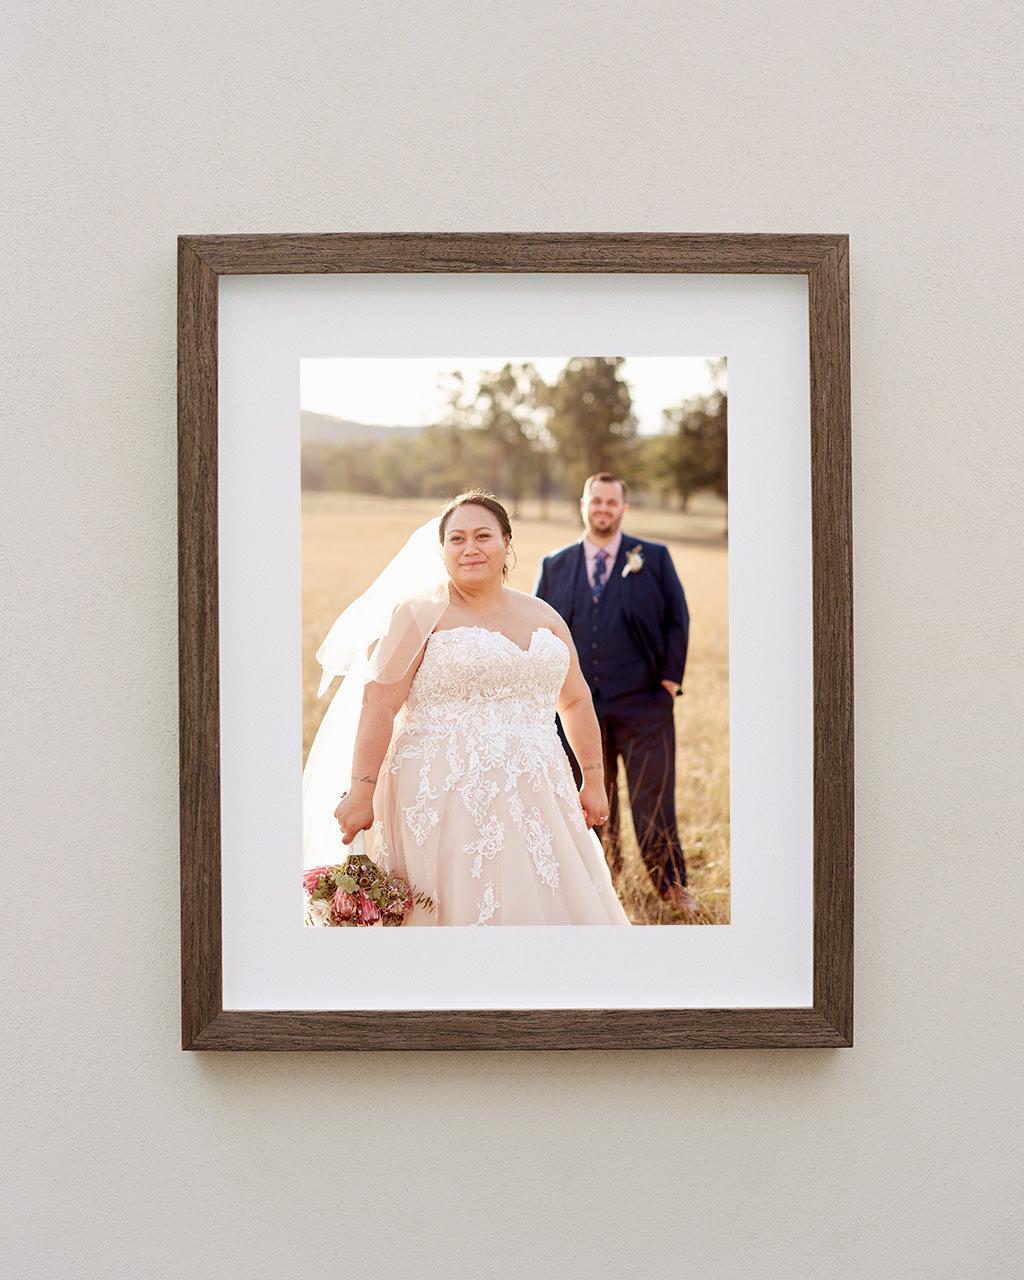 Framed portrait of bride and groom at Adams Peak Country Estate